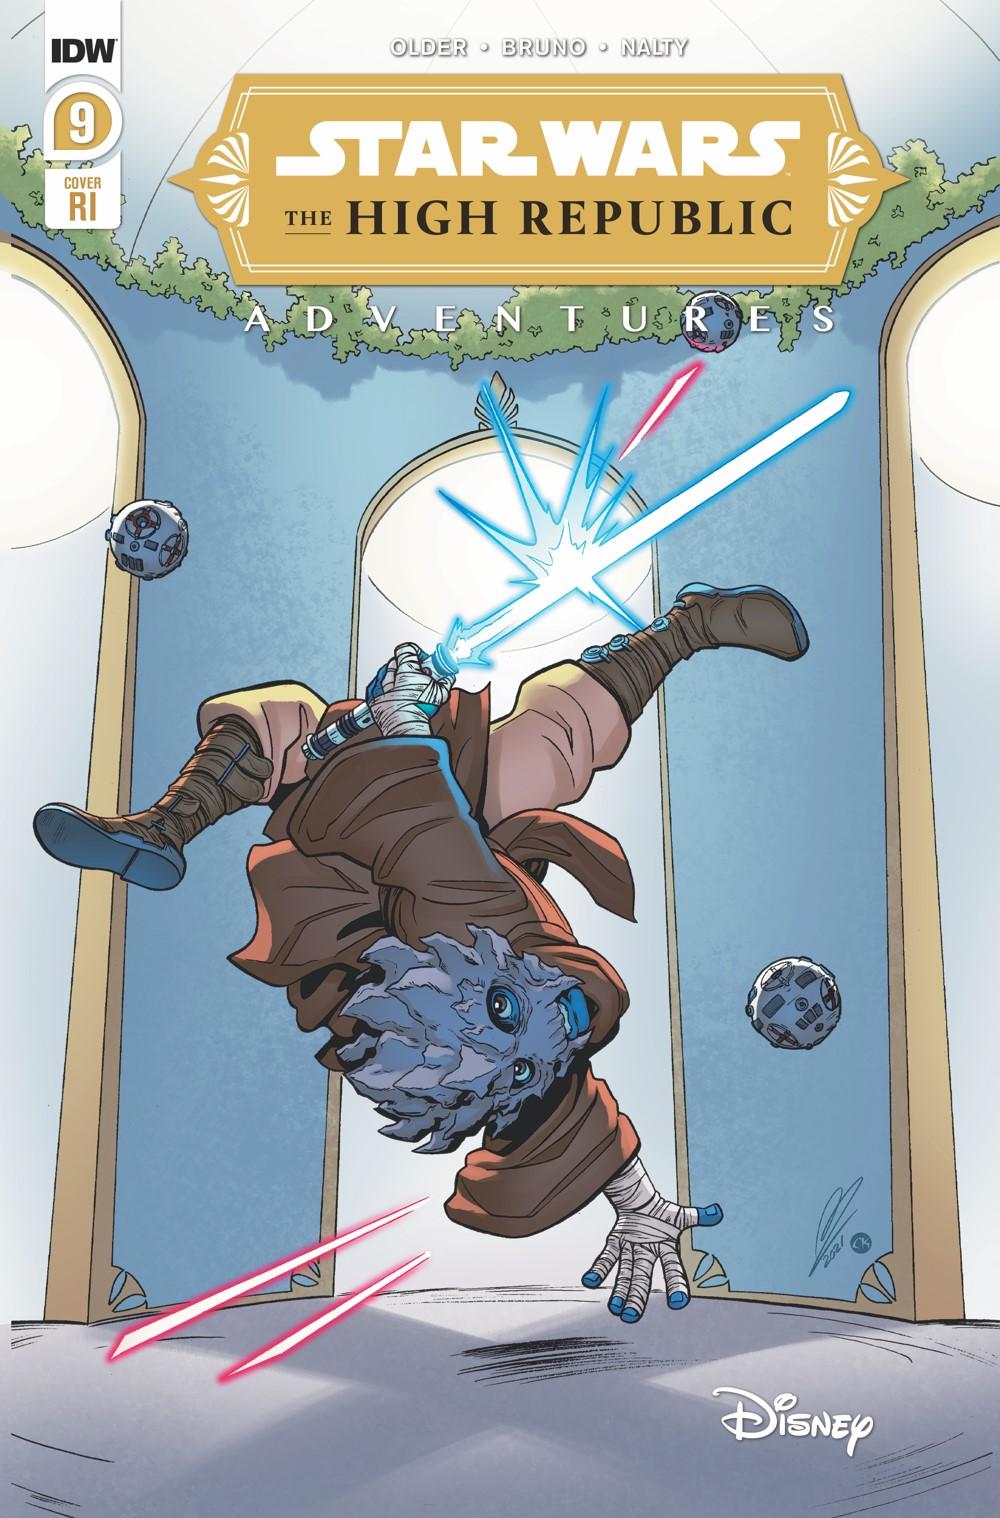 StarWarsHighRepublic-09-B ComicList: IDW Publishing New Releases for 10/06/2021